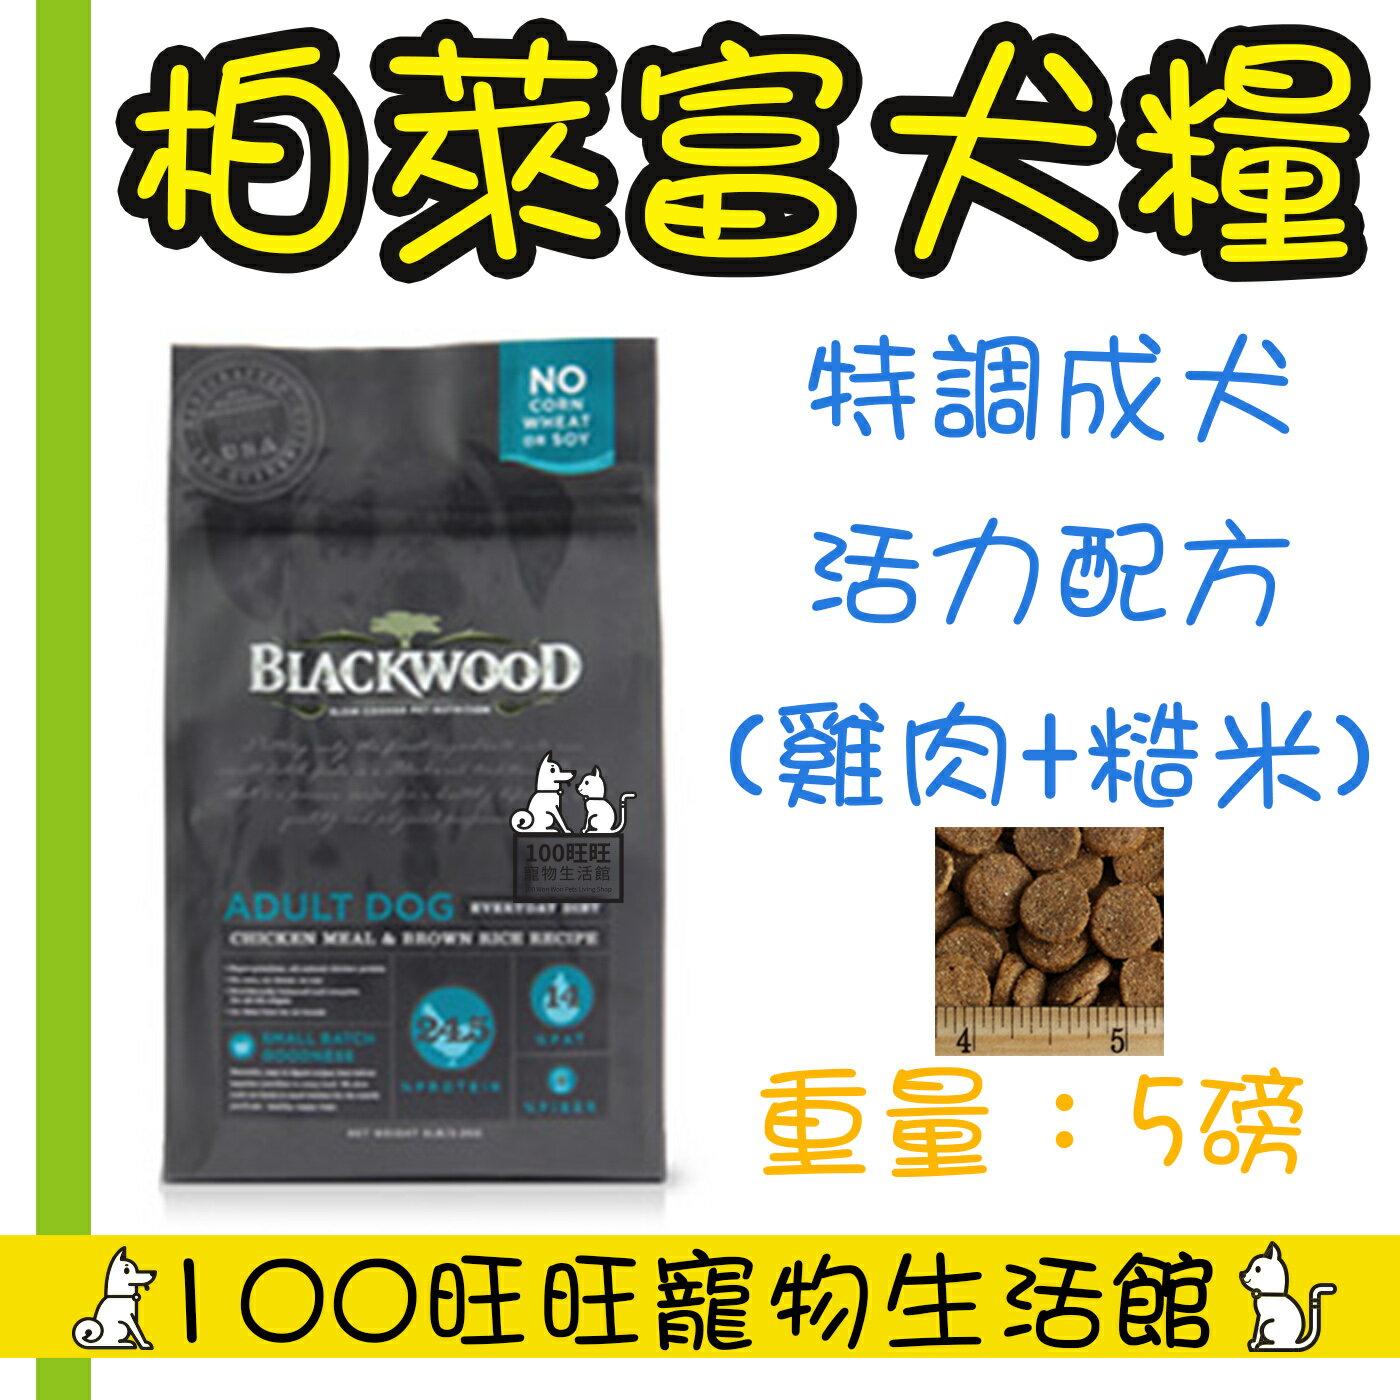 BLACKWOOD 柏萊富 特調成犬 活力配方 5lb (雞肉+糙米) 2.2kg